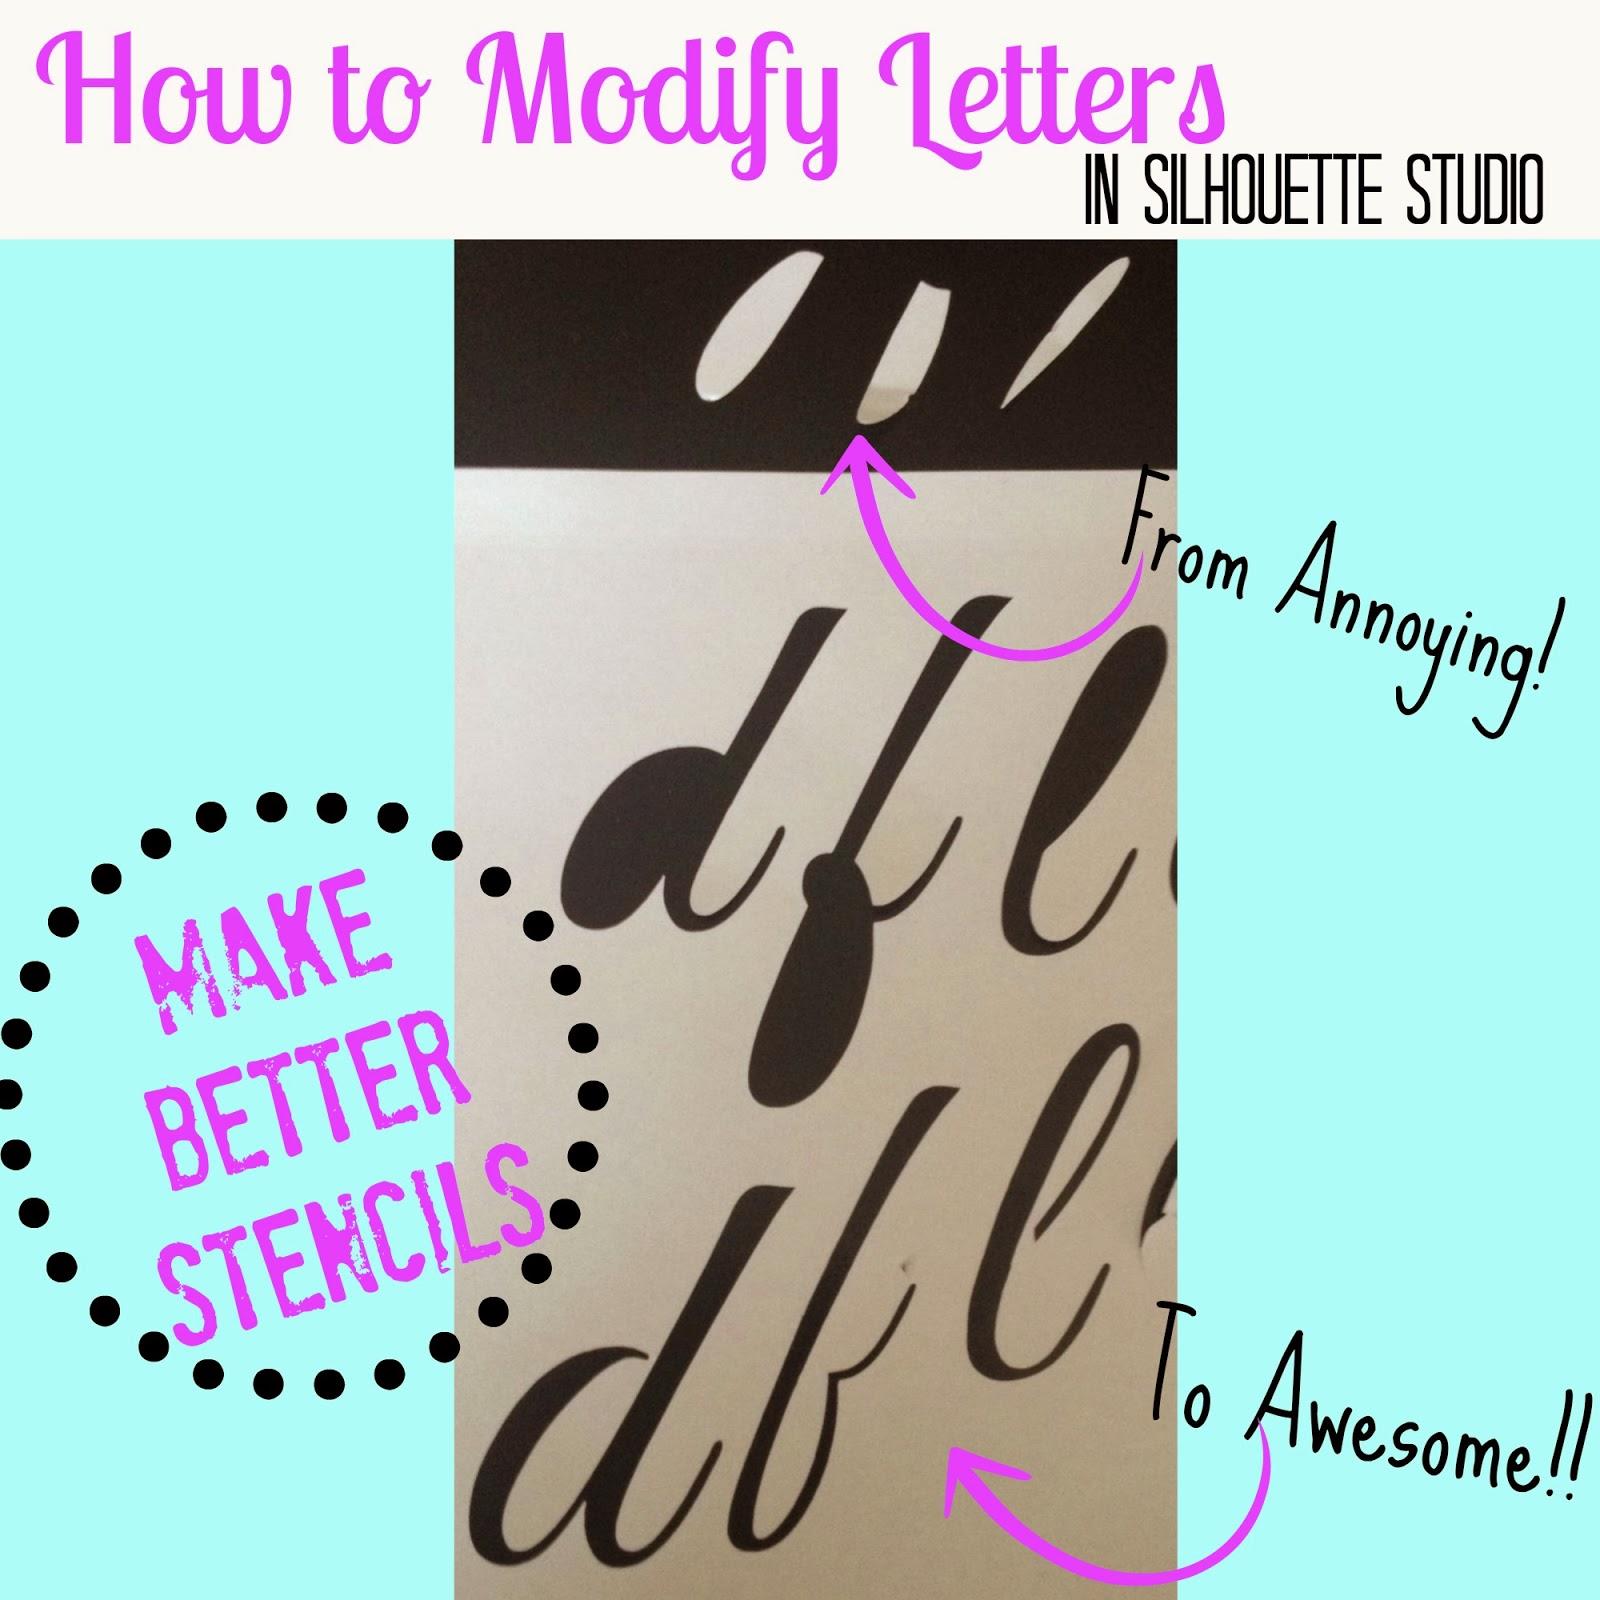 http://www.silhouetteschool.blogspot.com/2014/03/silhouette-tutorial-modifying-fonts-to.html